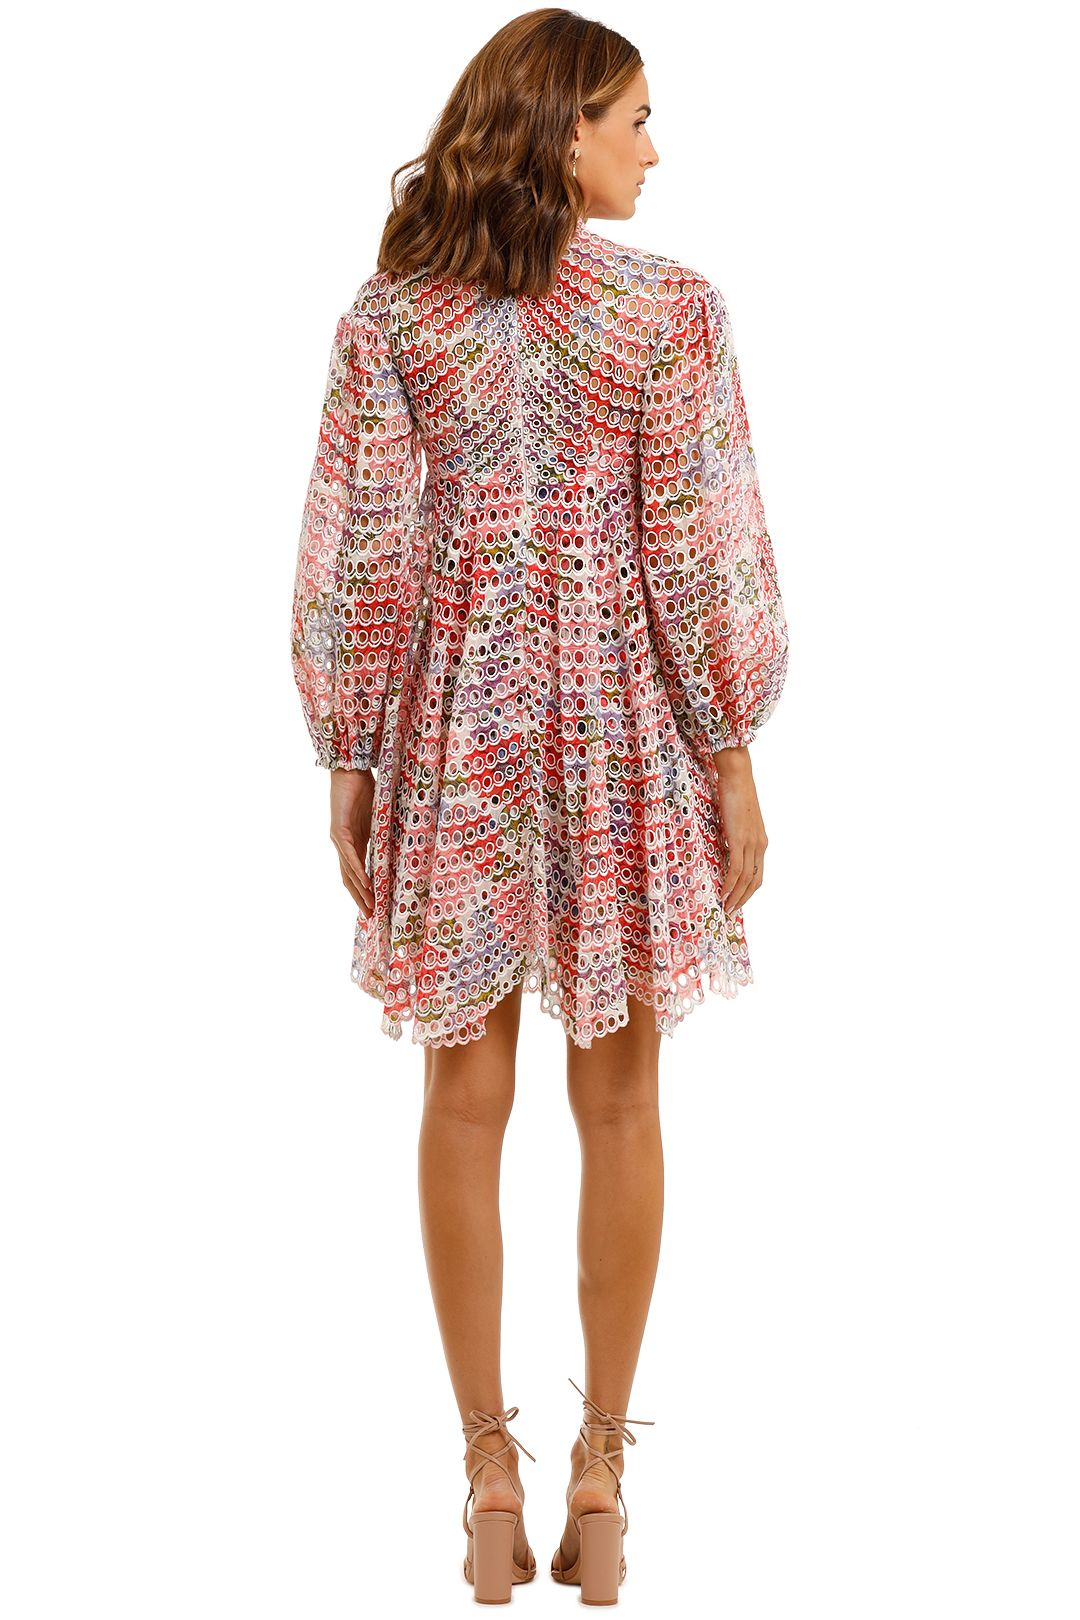 Zimmermann Poppy Ramie Mini Dress floral multi